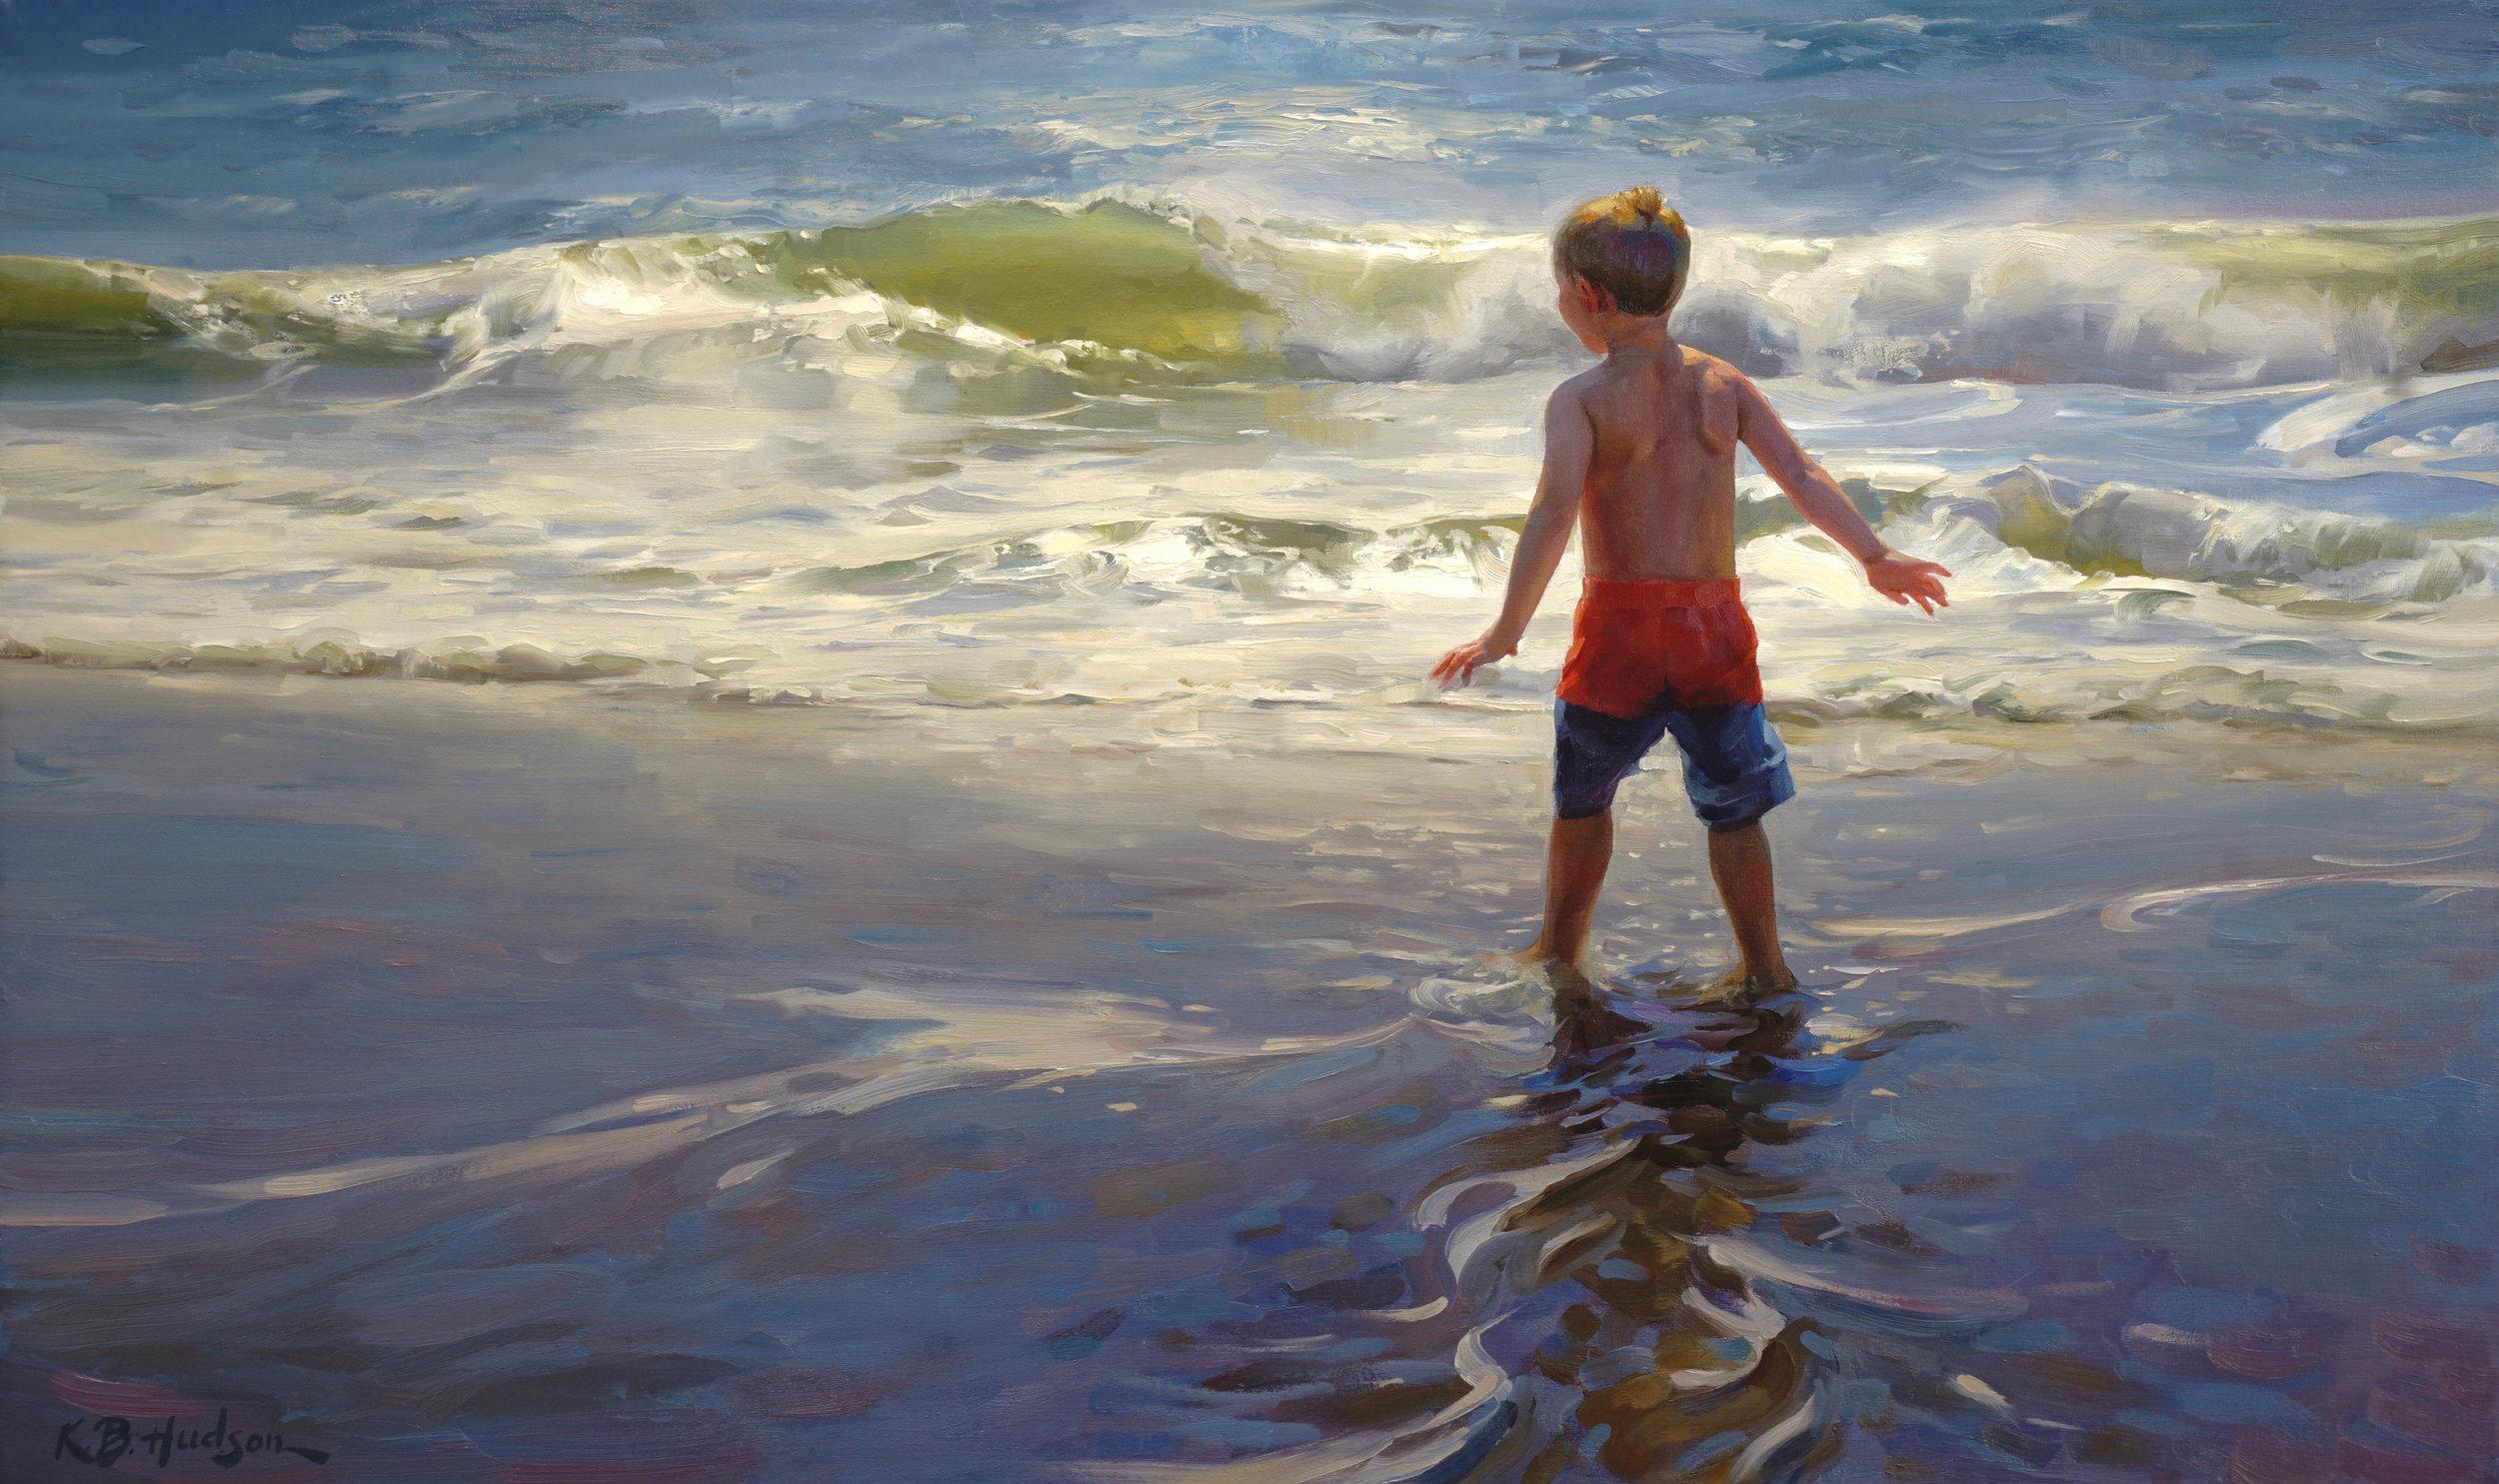 Kathleen_Hudson_When my son beheld the sea.jpg